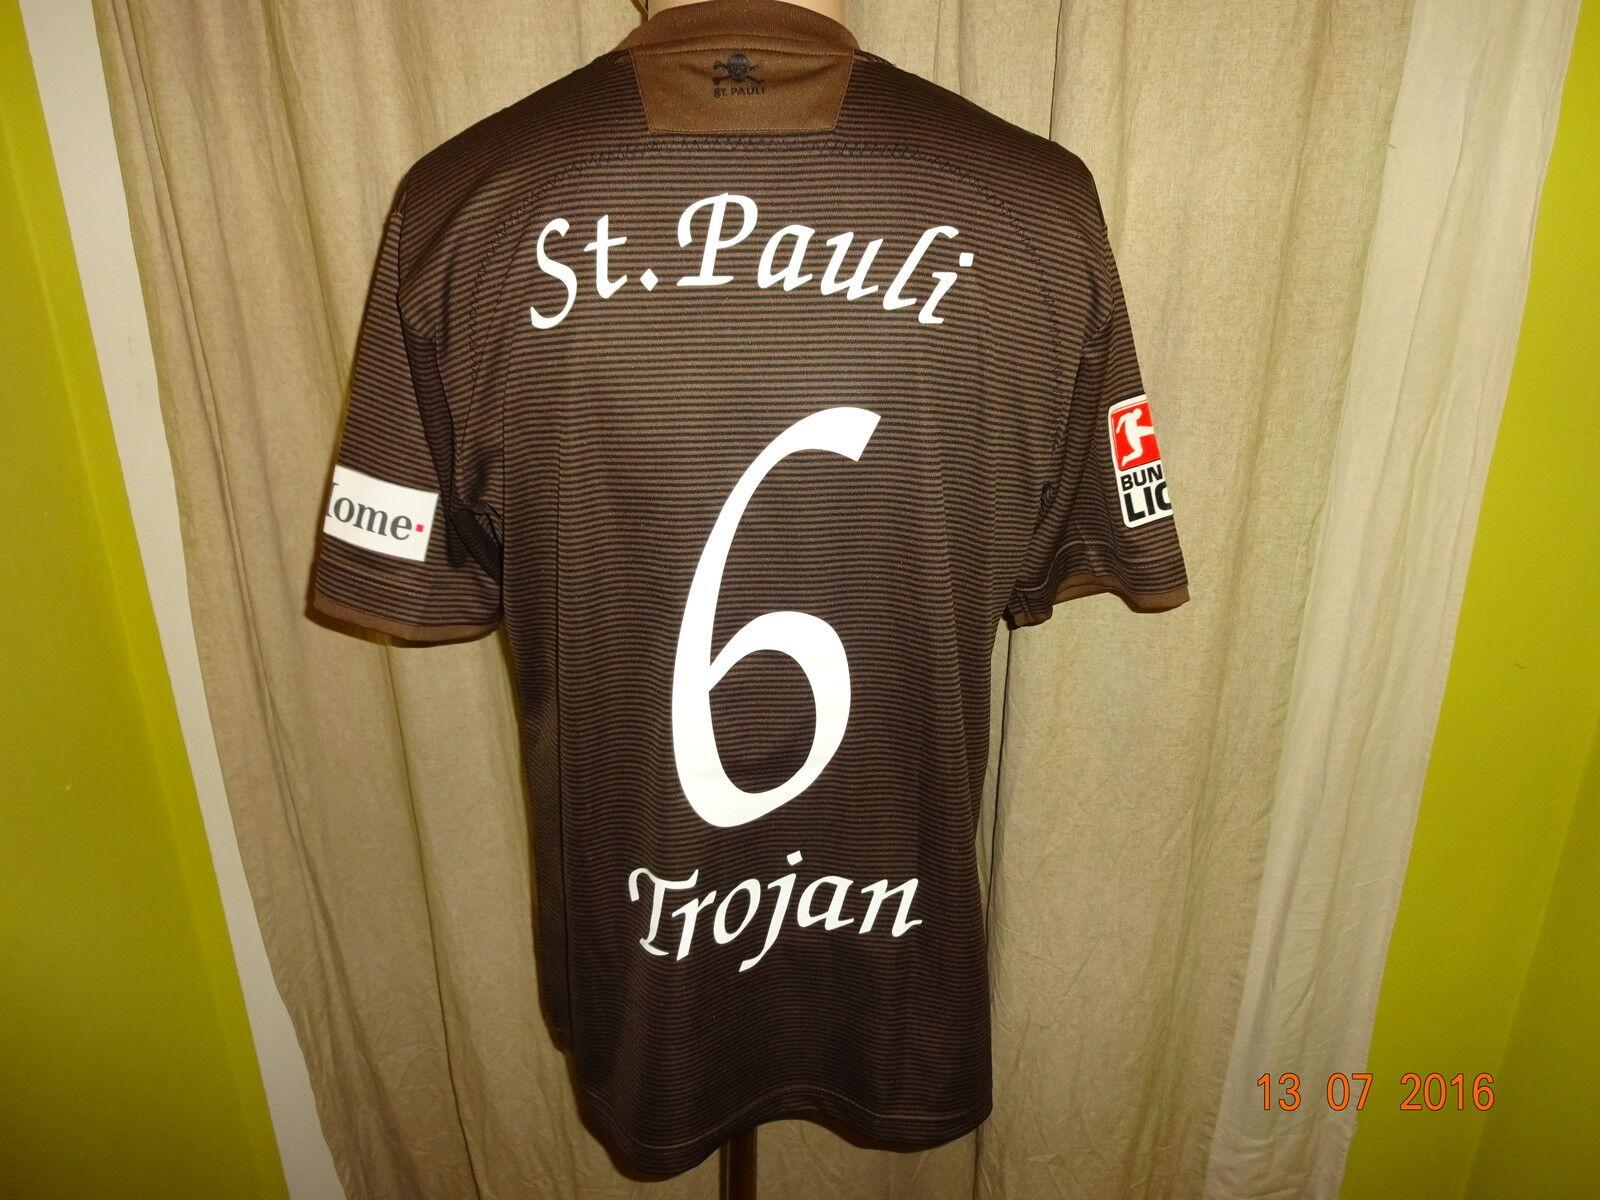 FC St.Pauli DoYou Fotball Matchworn Trikot 2008/09